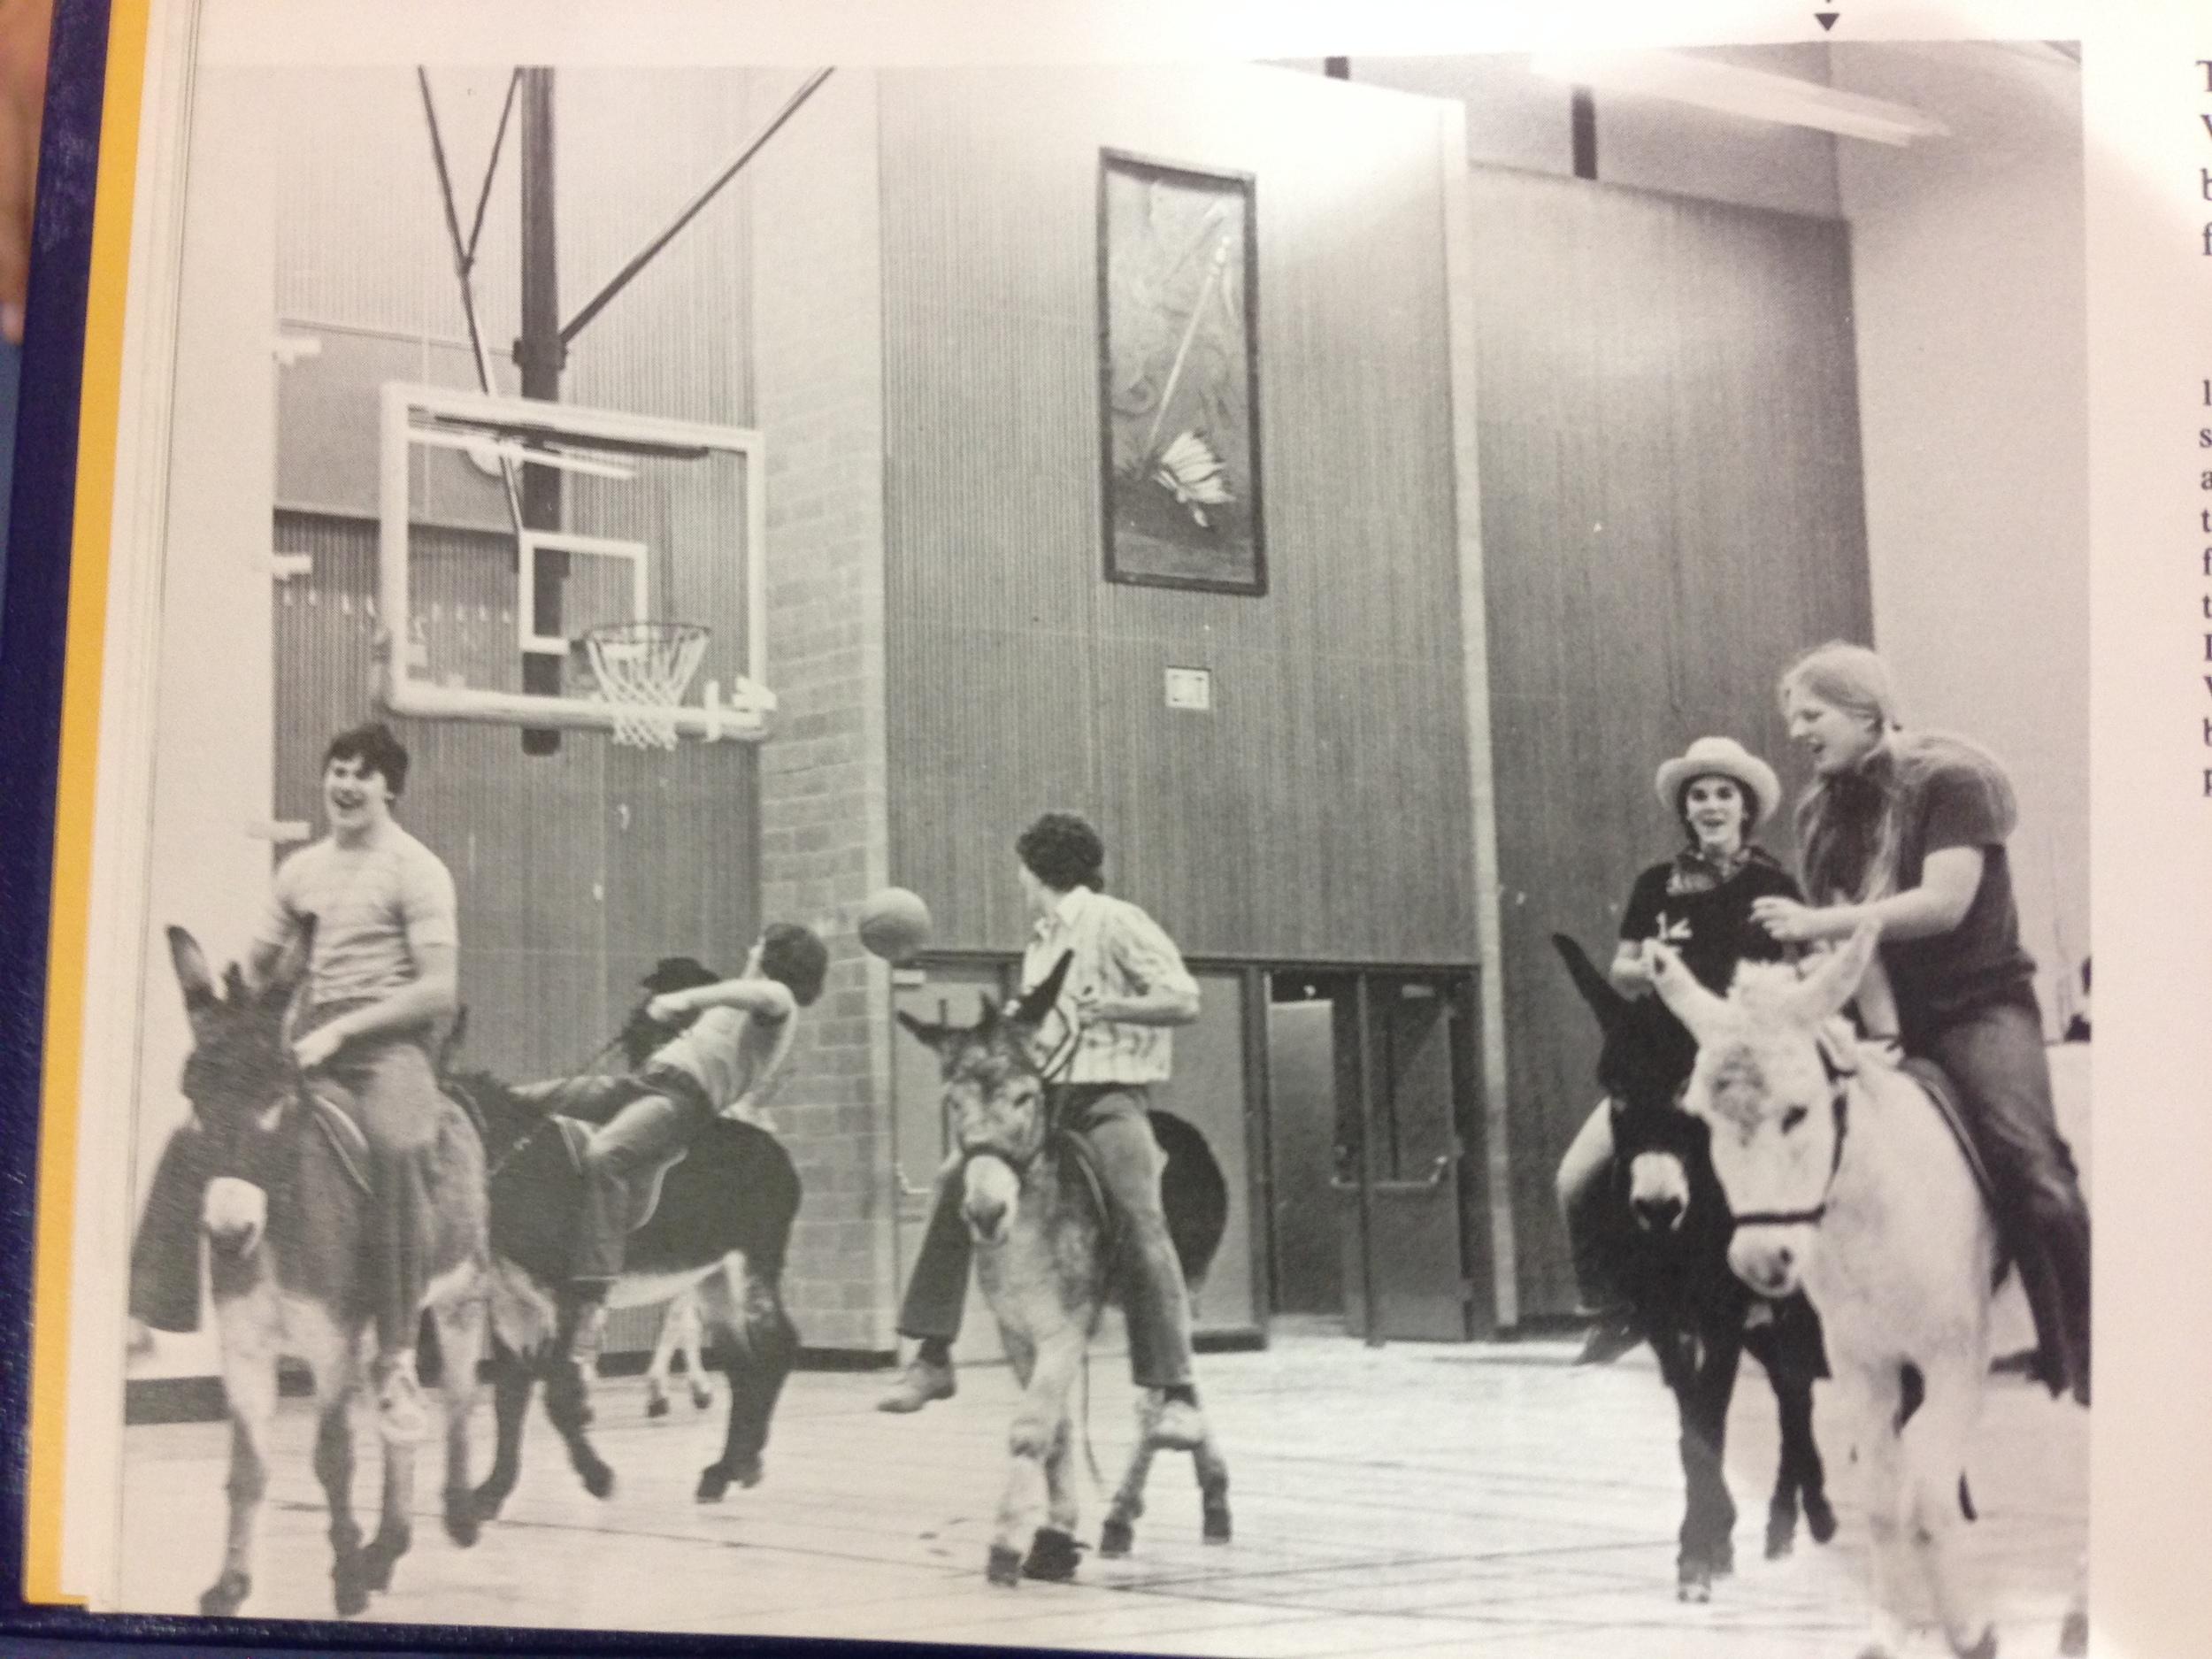 1974 Donkey bball.jpg